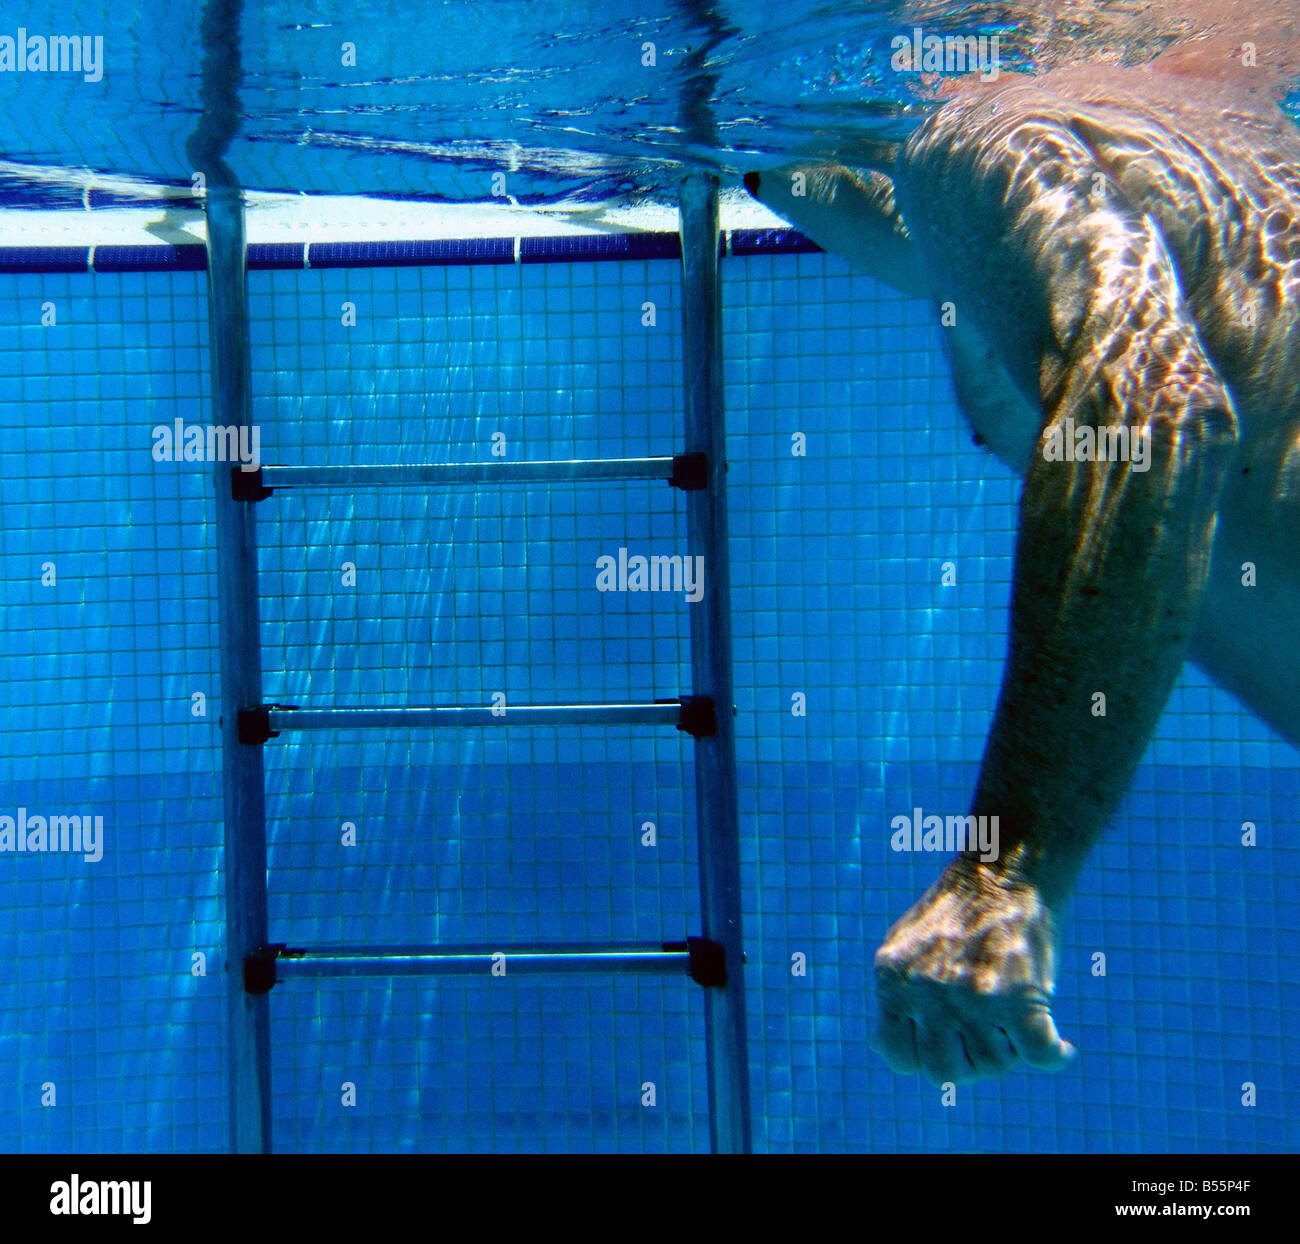 man swimming near pool exit ladder - Stock Image